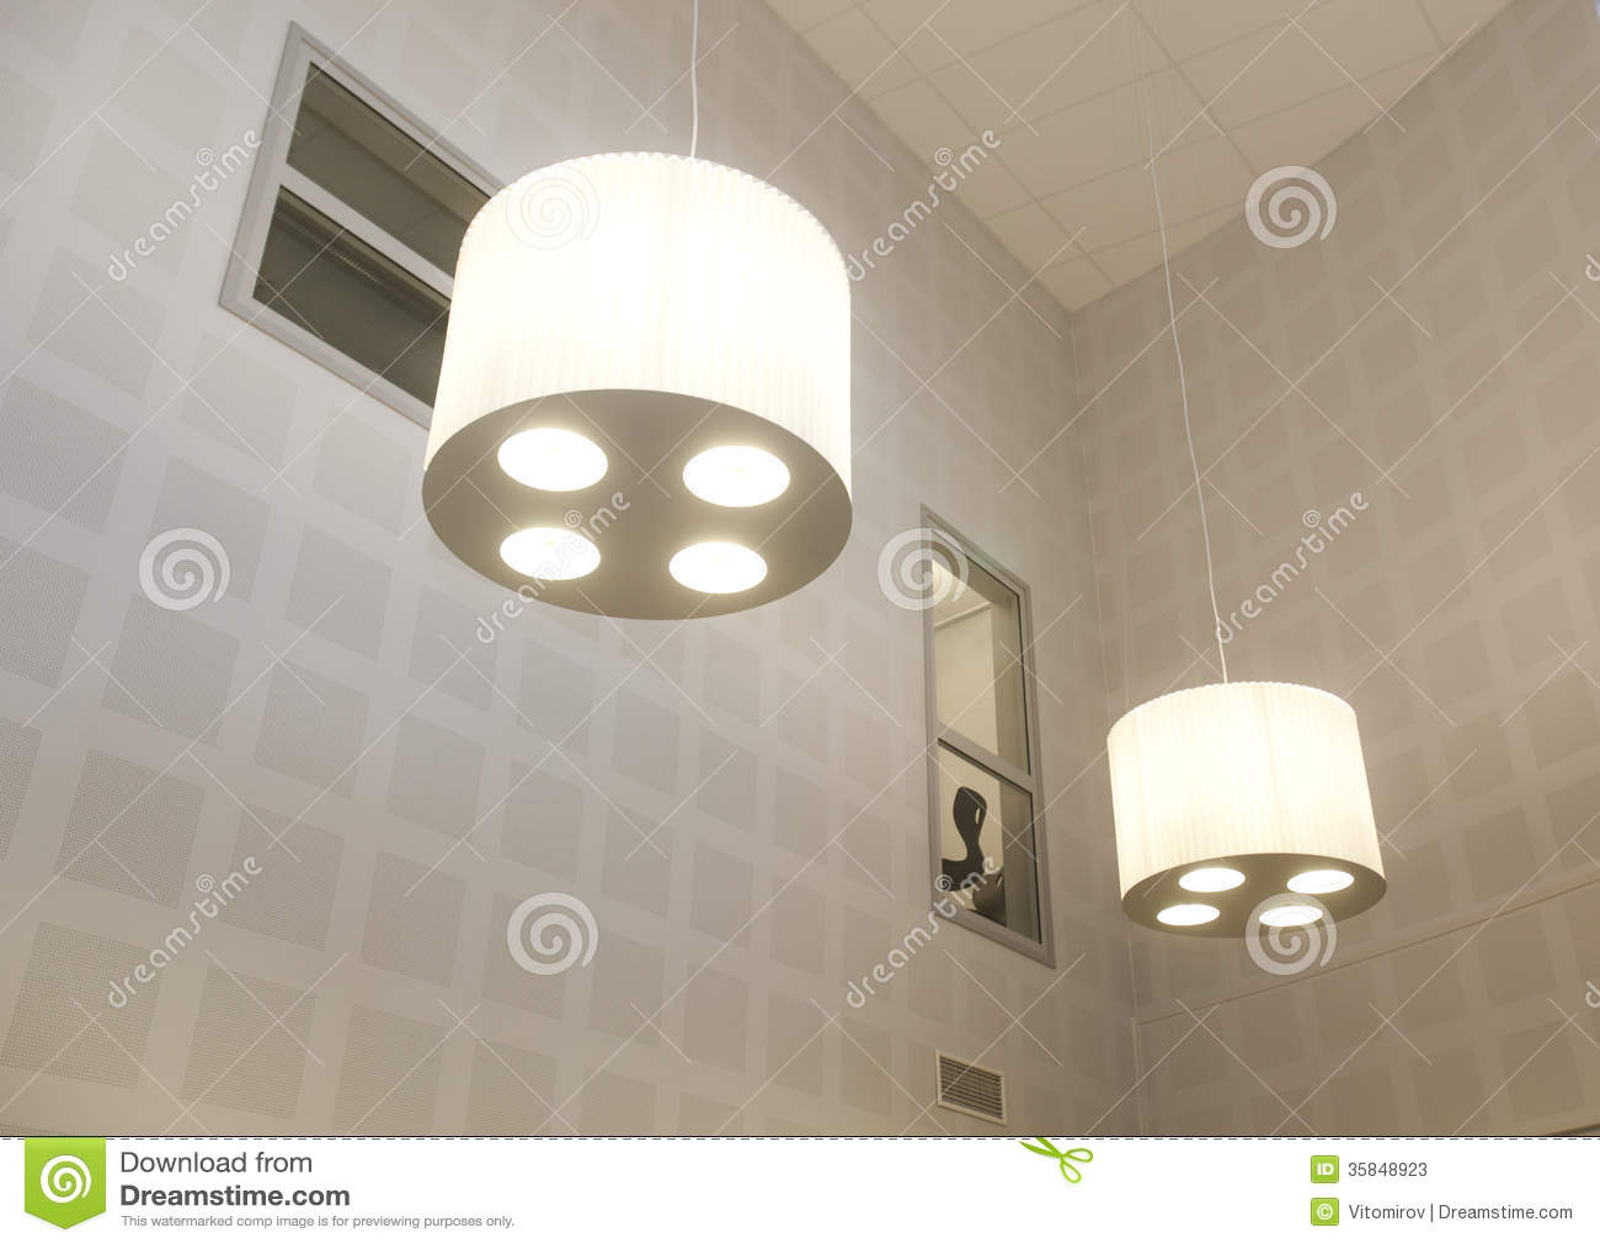 moderne lampen stockbild bild von ausr stung klassisch 35848923. Black Bedroom Furniture Sets. Home Design Ideas